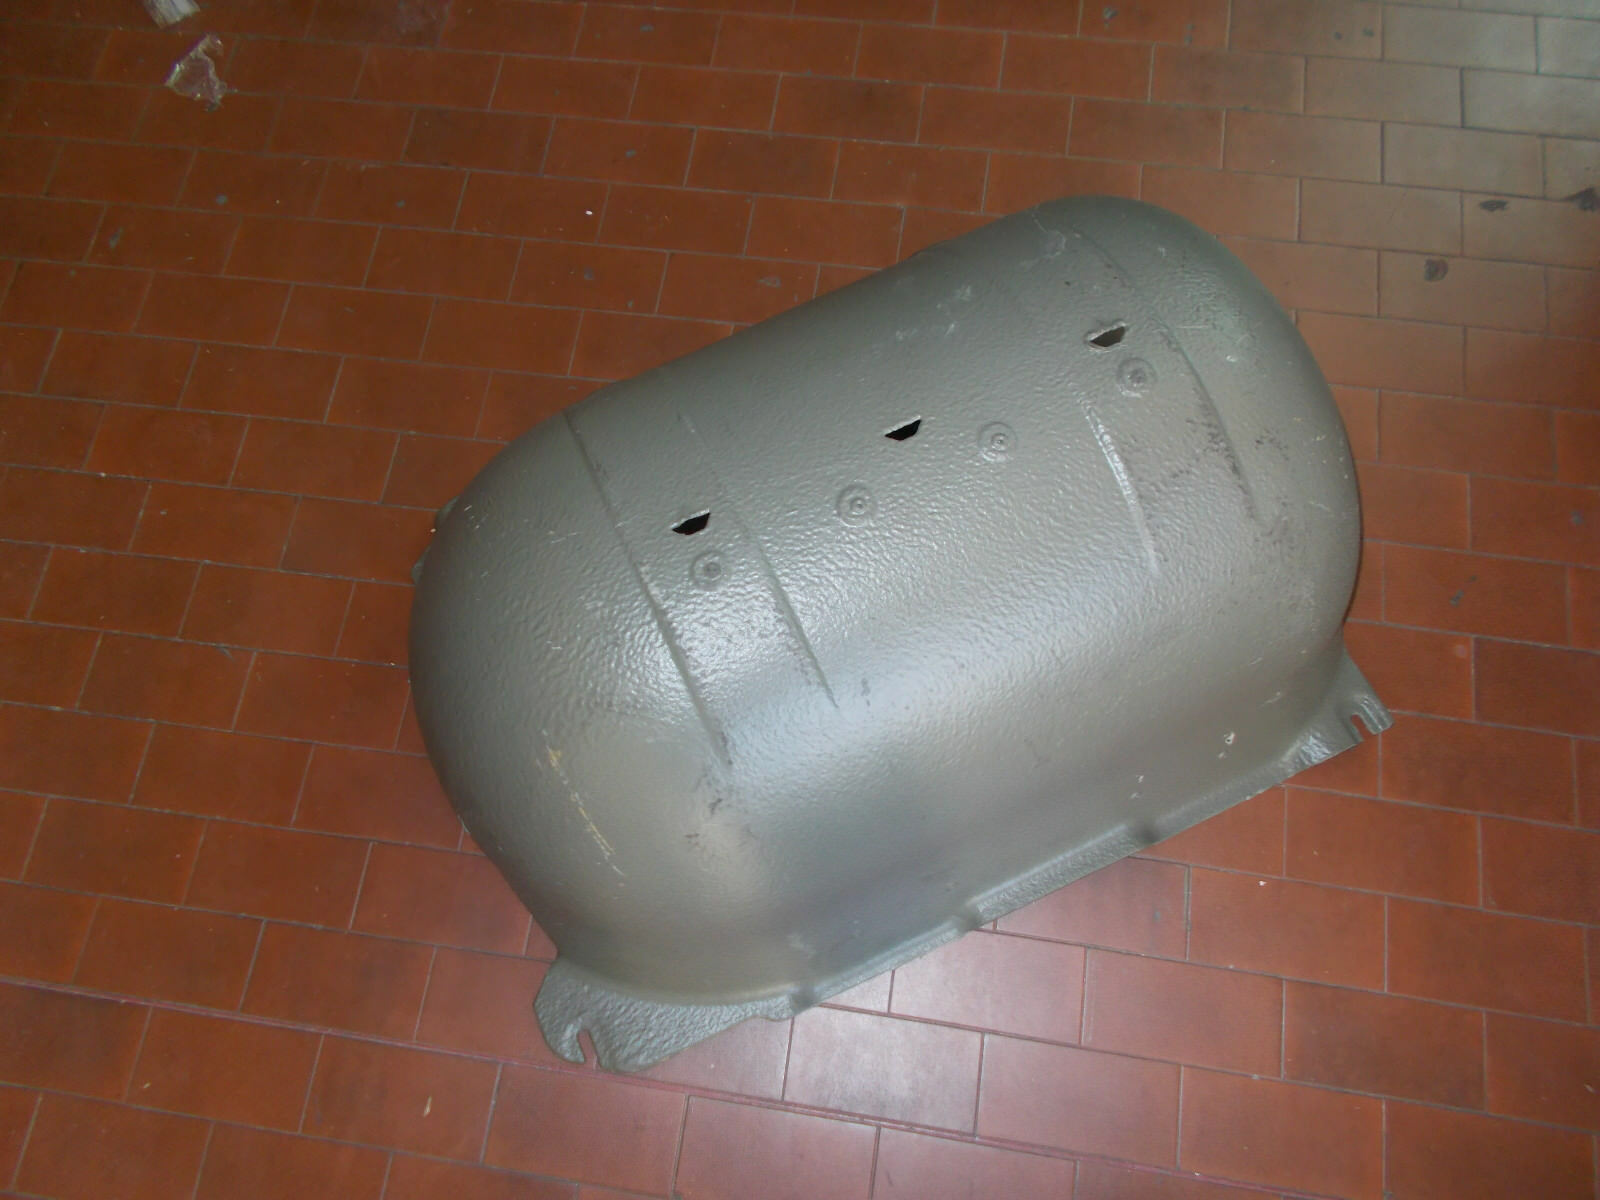 Valvola Bombola Metano Elettrovalvola Landirenzo 10R-036344 Type BM12